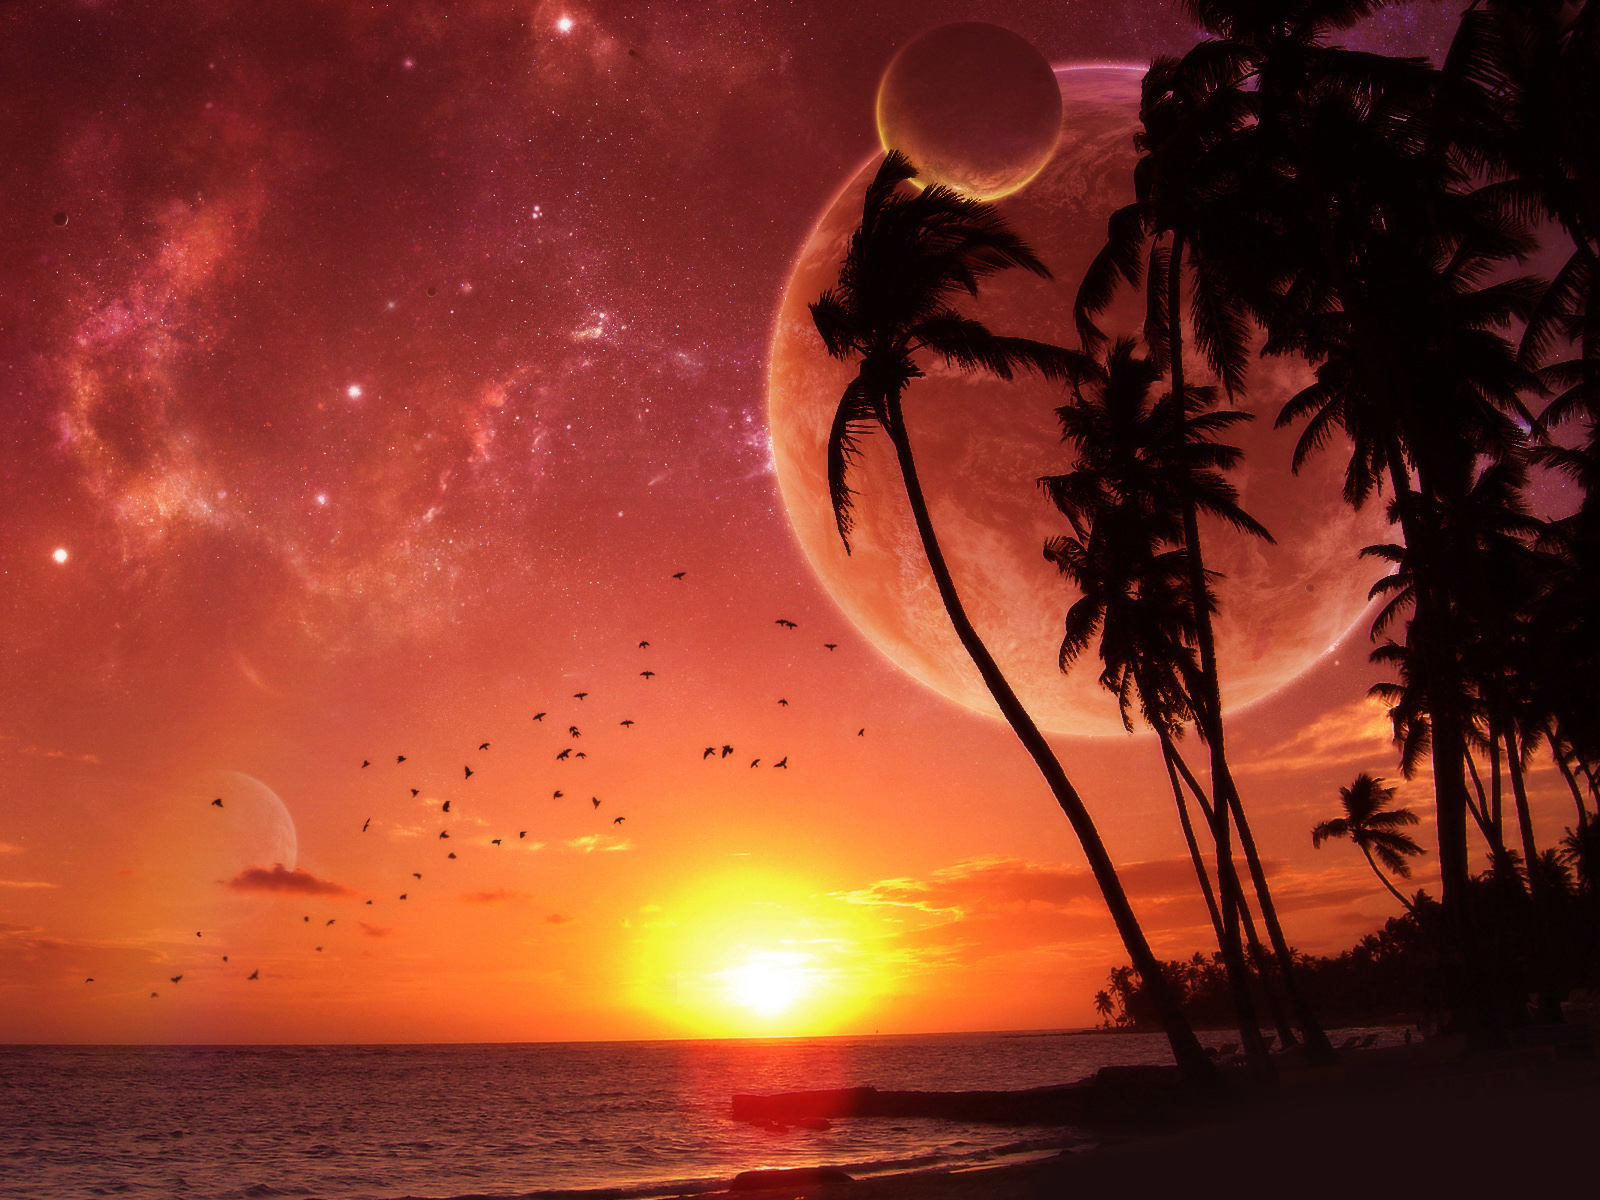 alien sunset wallpaper - photo #3